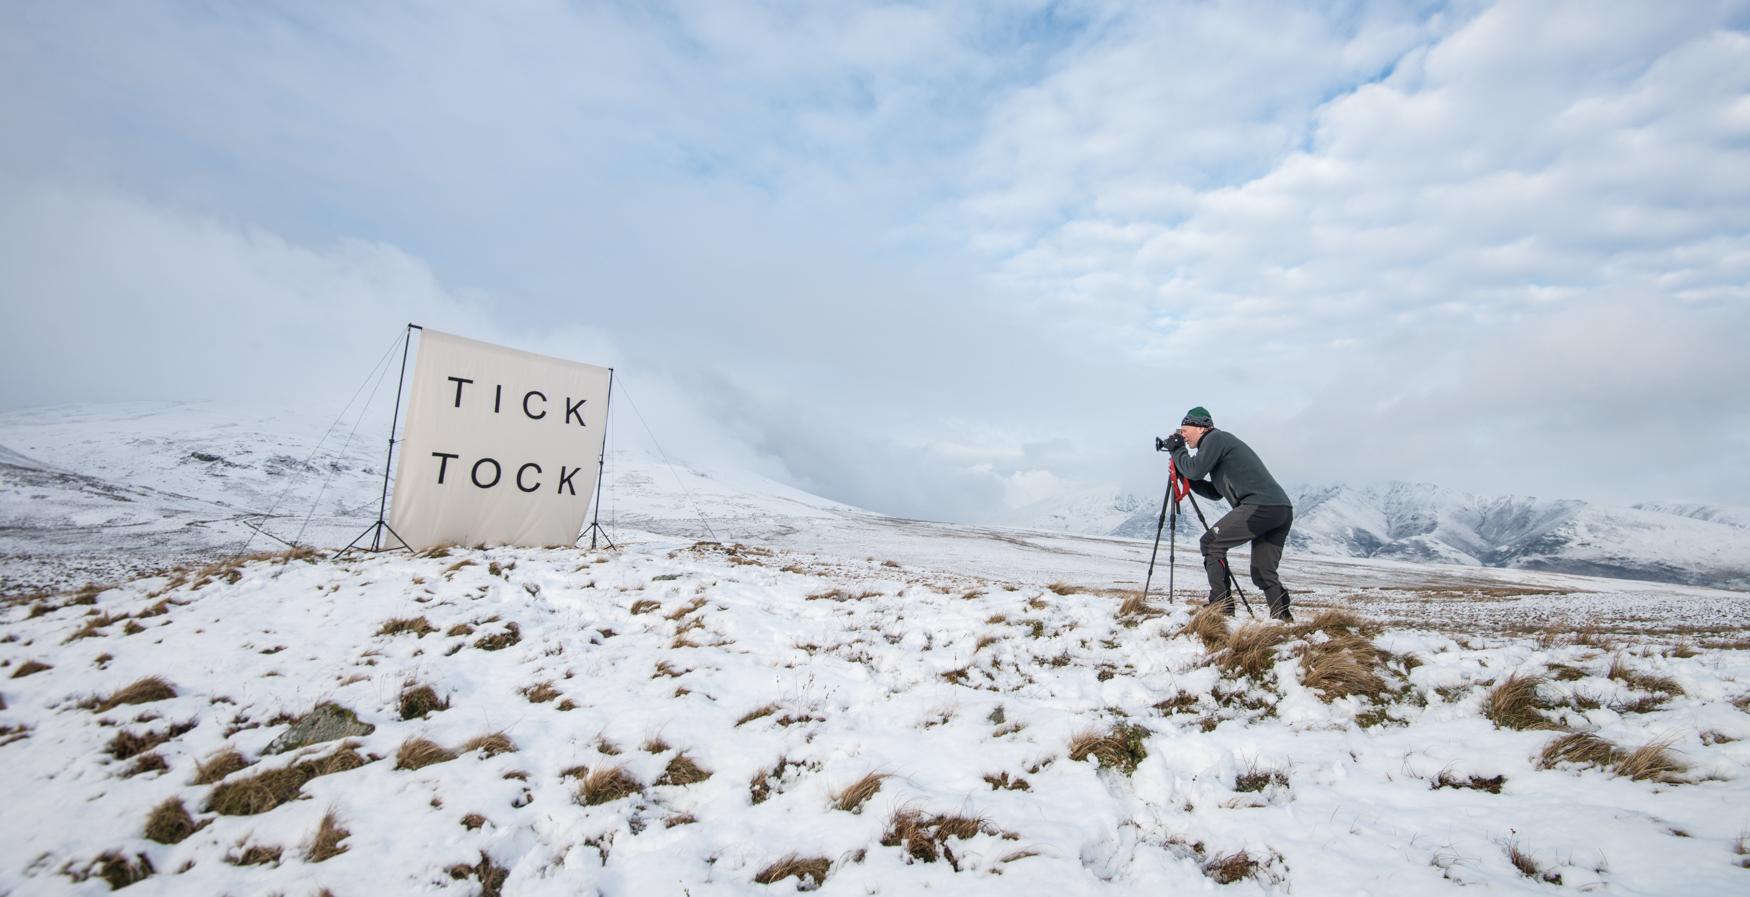 photographing Tick Tock on the Linhof film camera